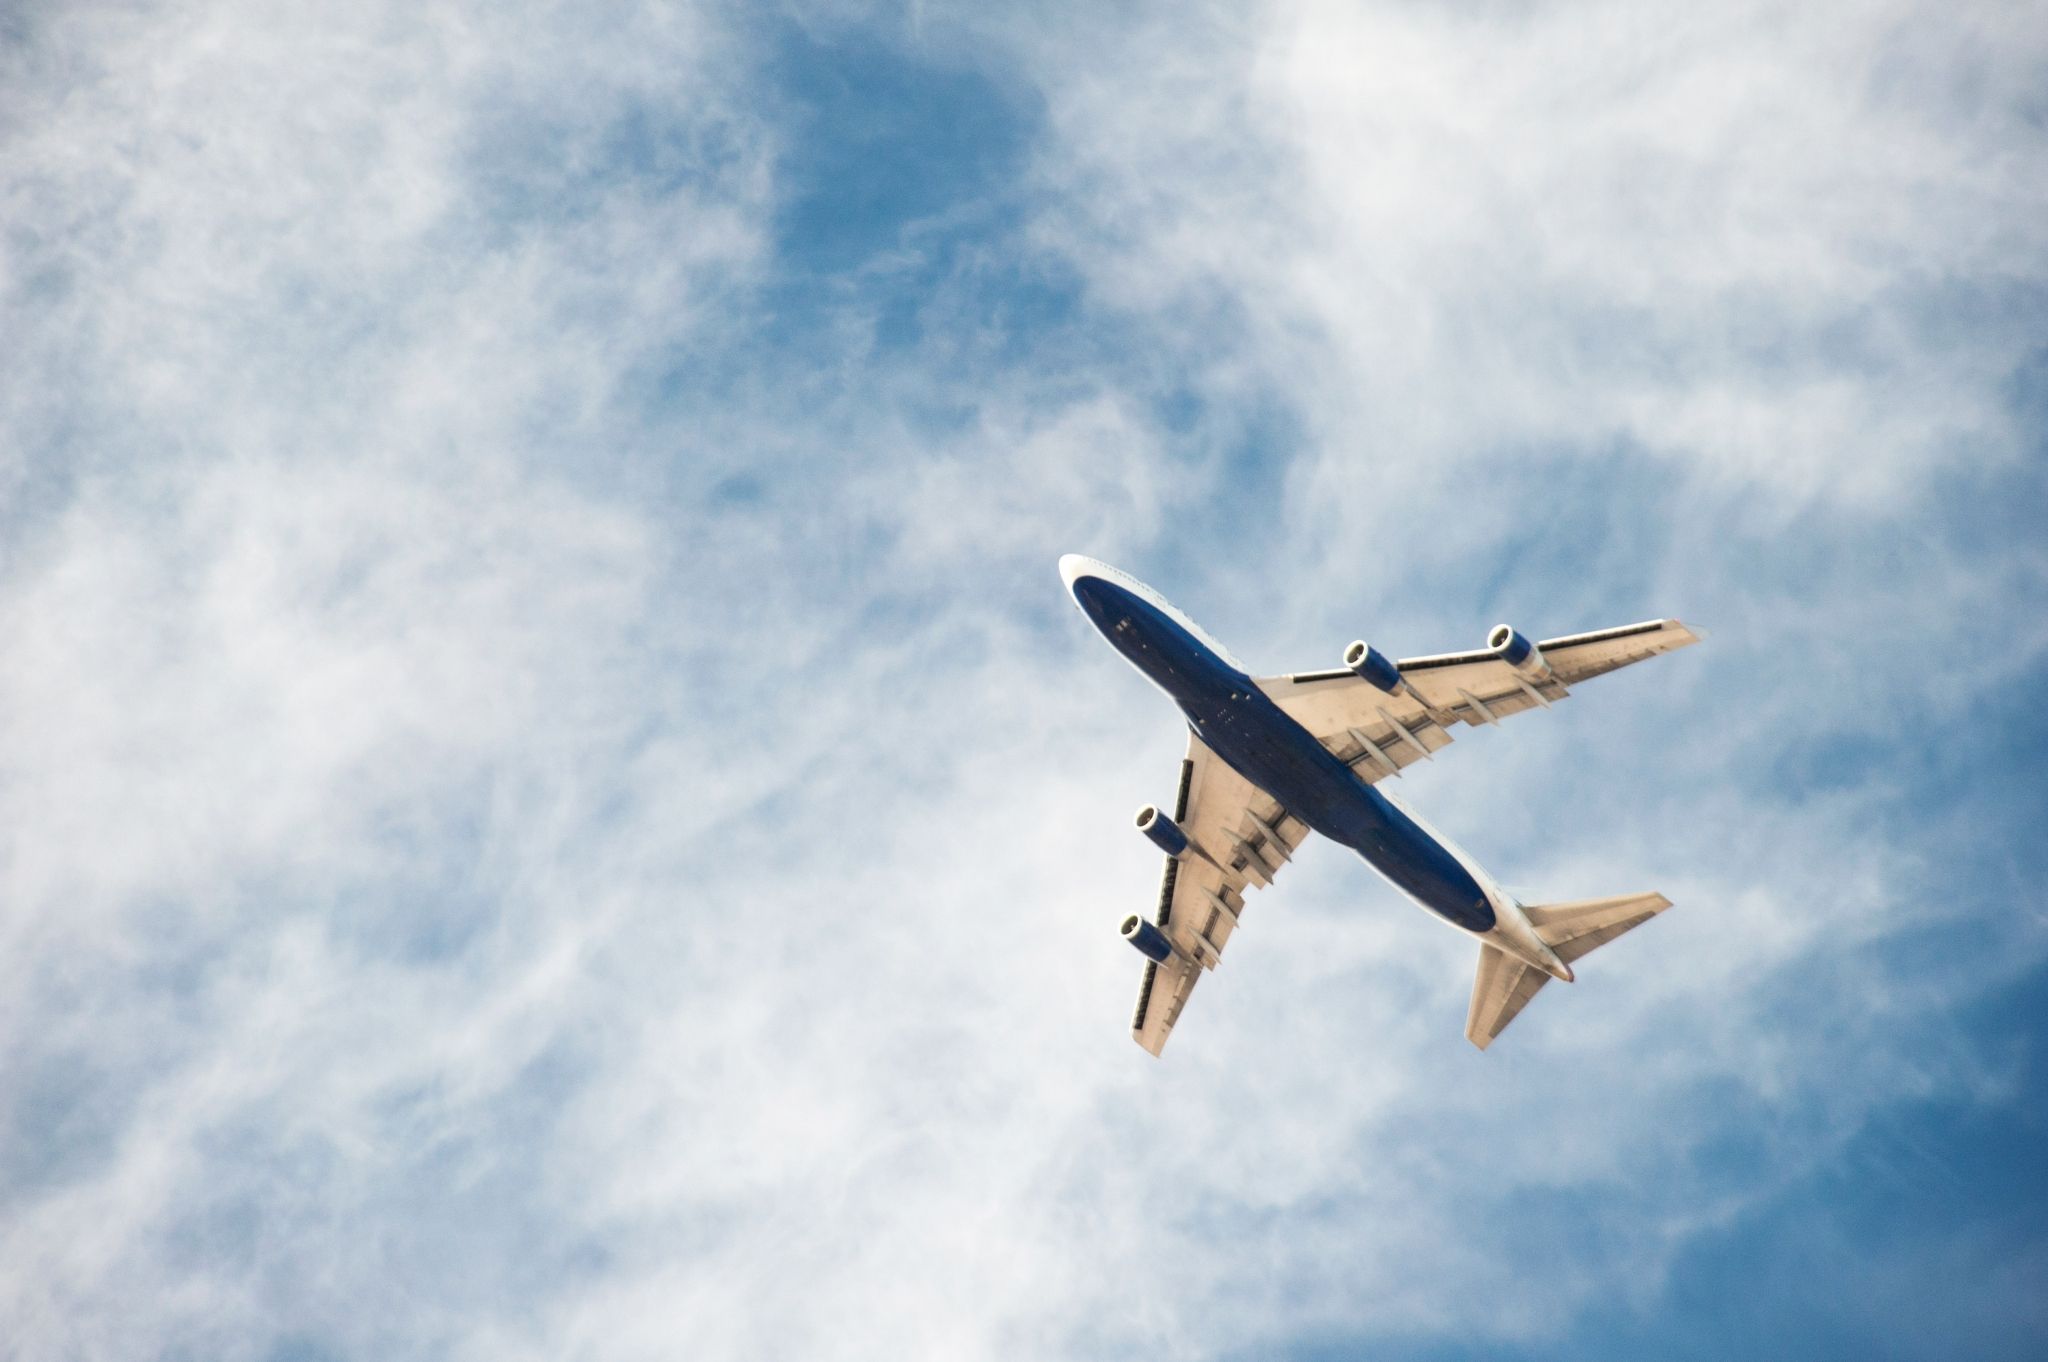 Airplane Desktop Wallpaper Hd Wallpapers Low Cost Flights Travel Pictures Hd Wallpaper